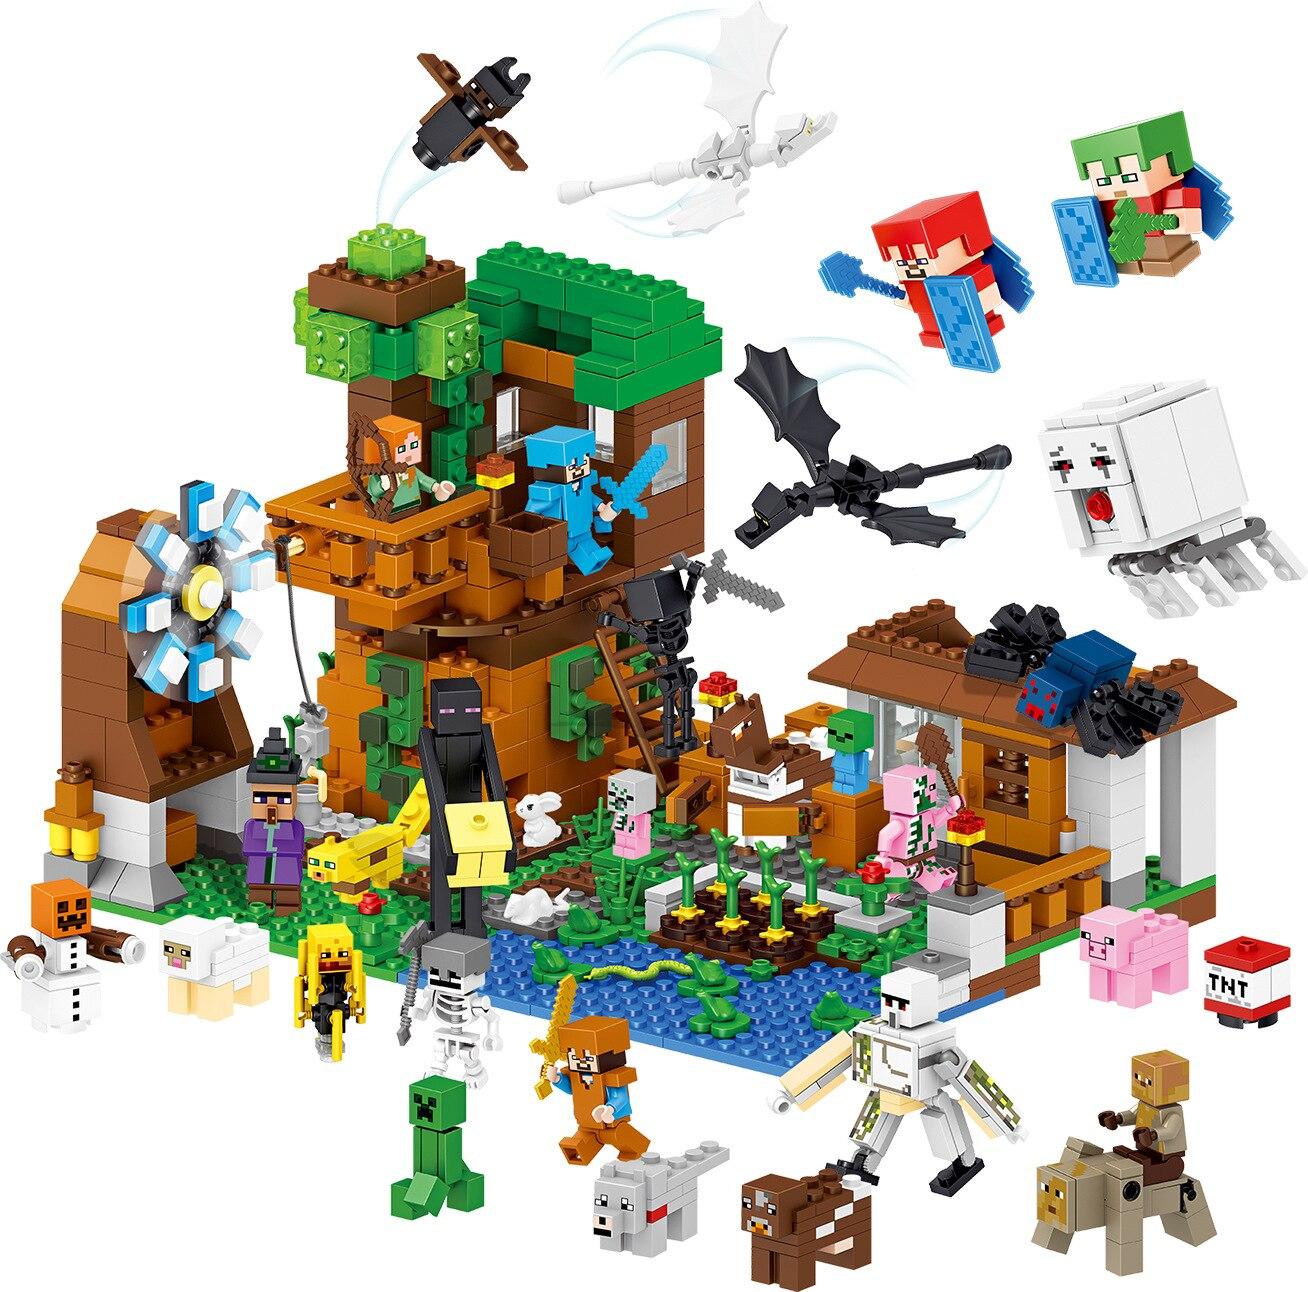 33163 1007pcs My World Luxury Tree House Pet Village Farm Windmill Lele Building Blocks Brick Toy 33068 1516pcs lele my world minecraft the village